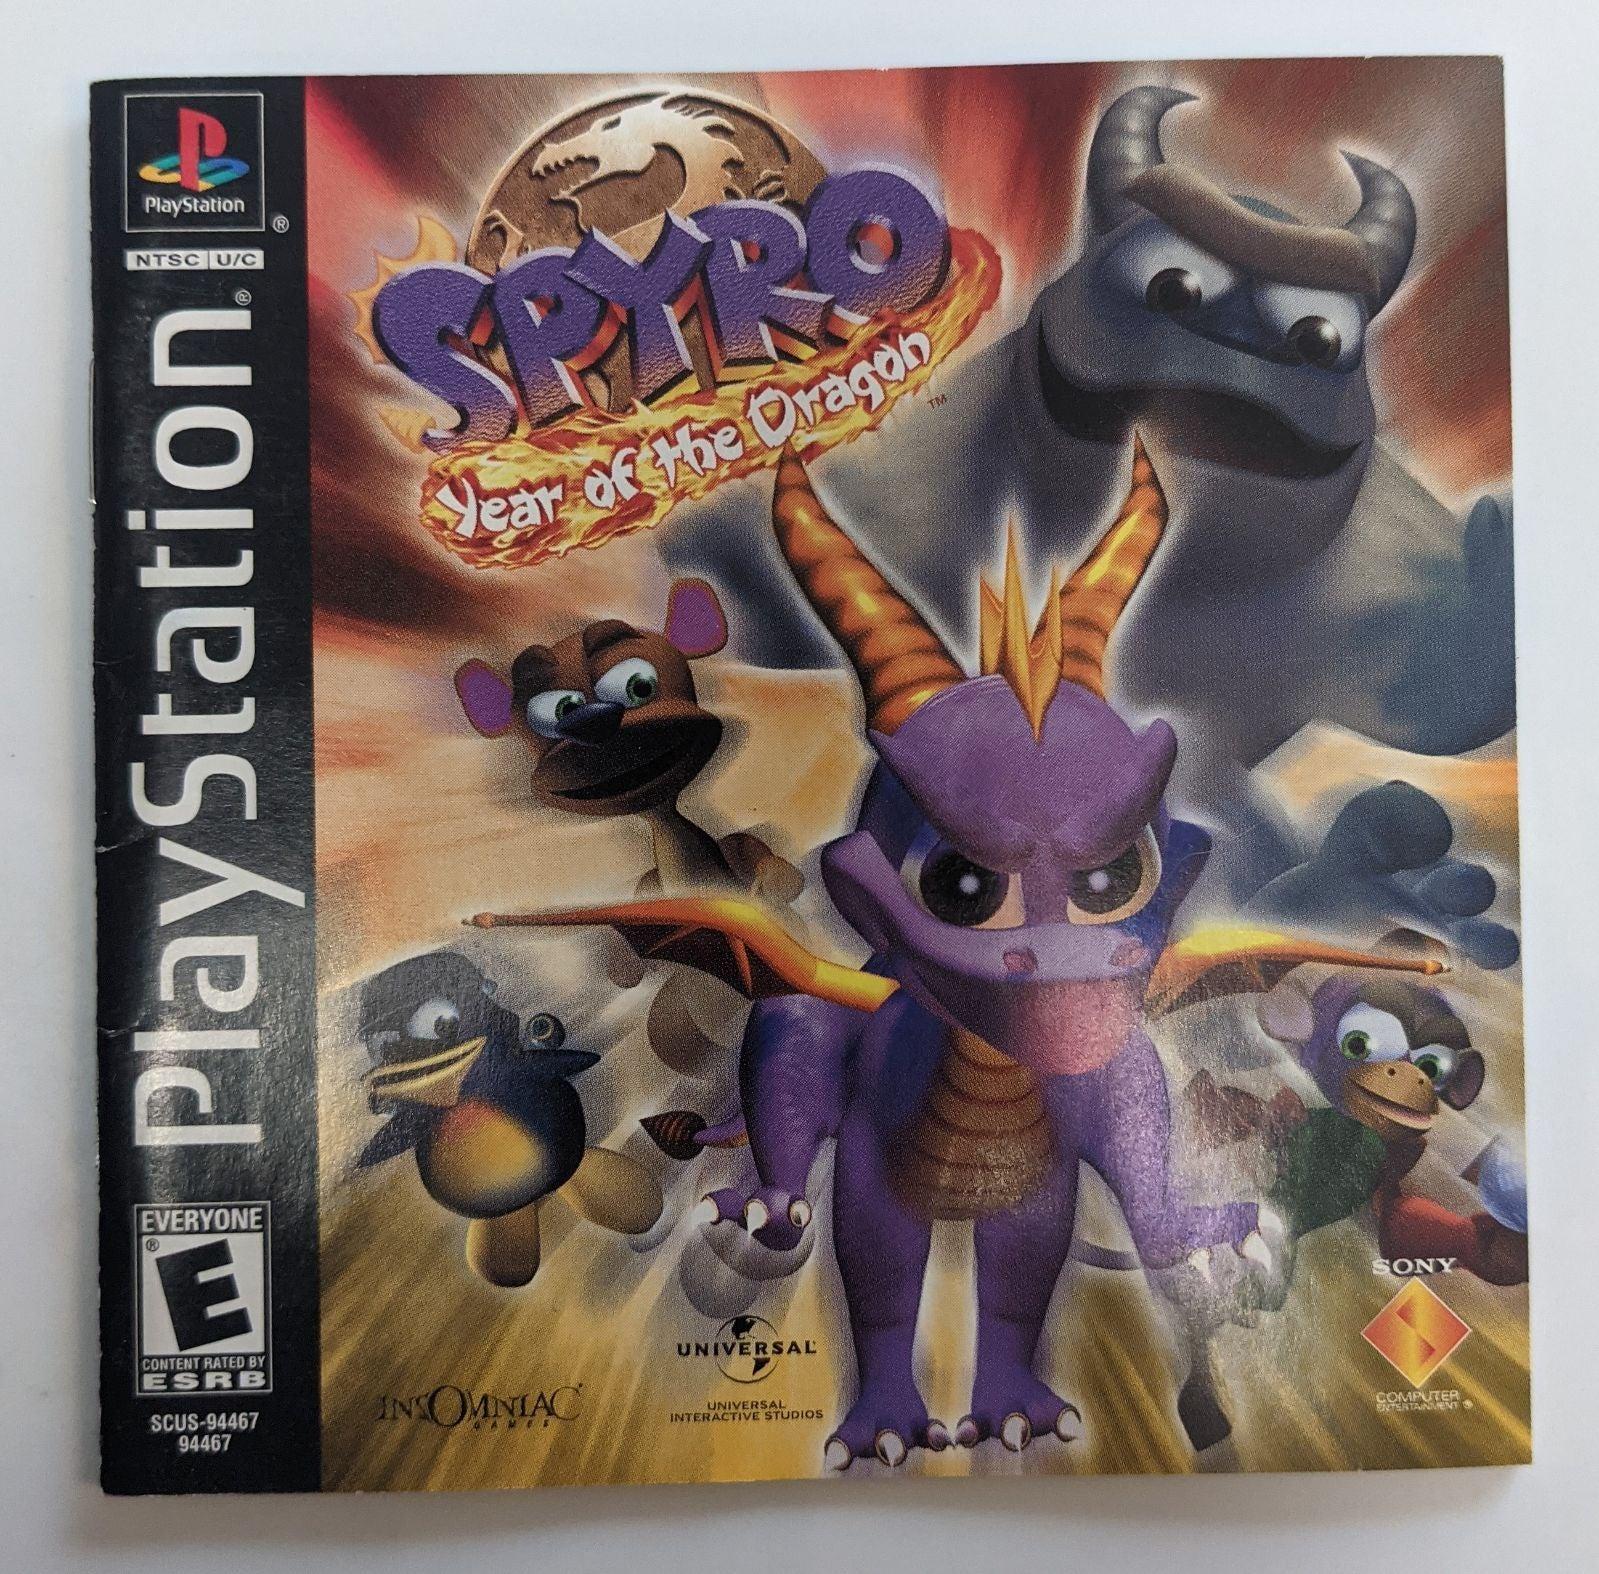 Spyro: Year of the Dragon on Playstation